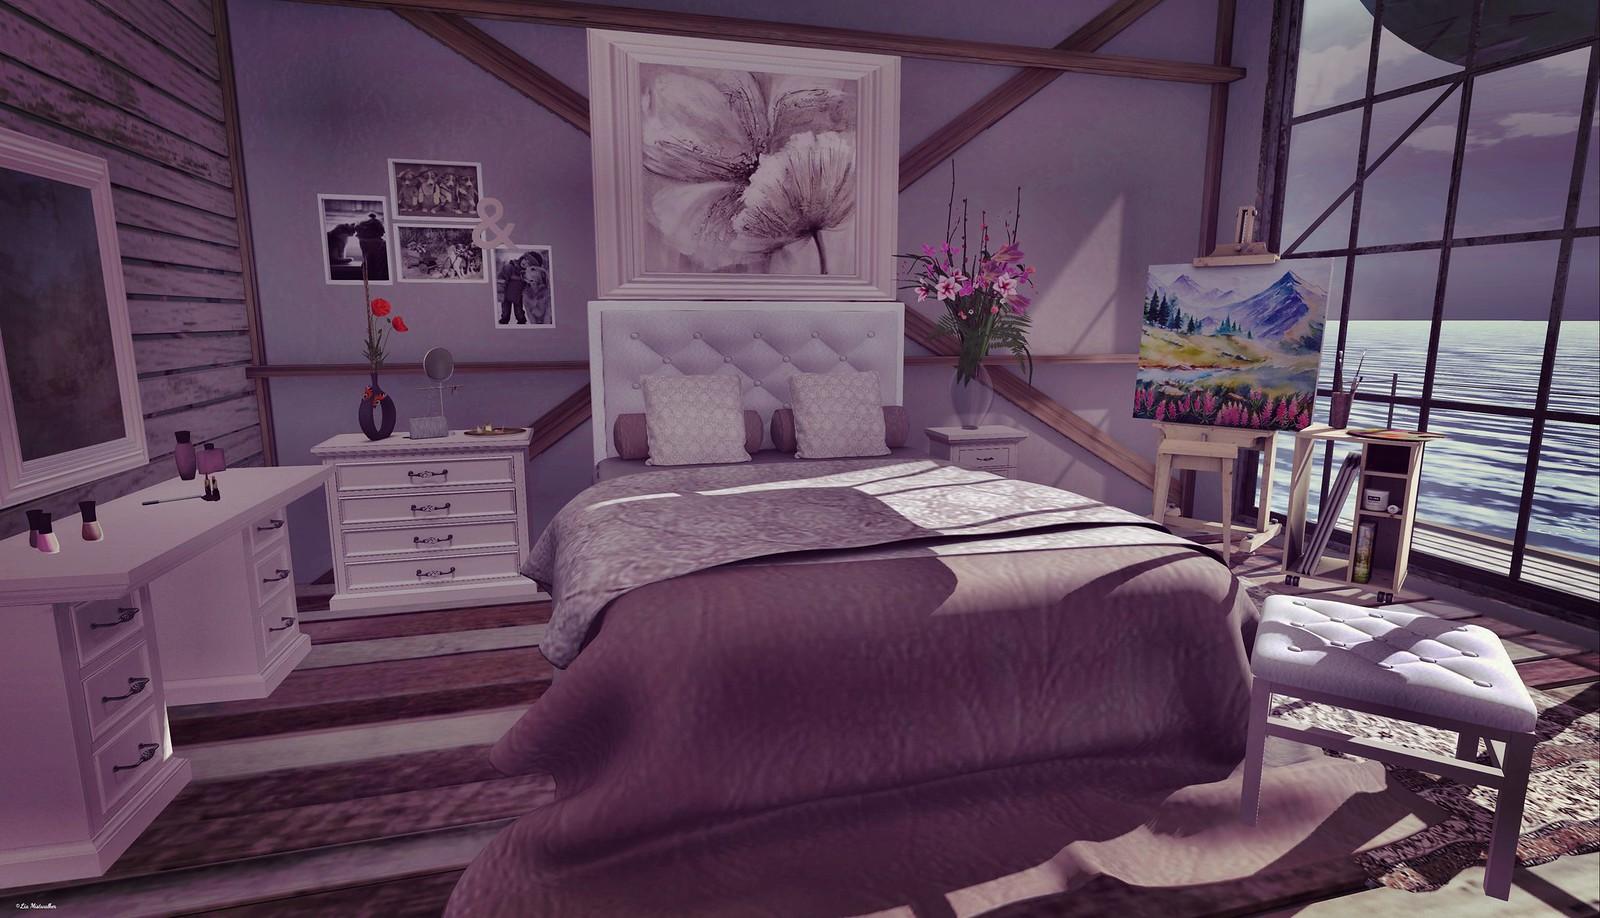 Home & Decor Therapy #636